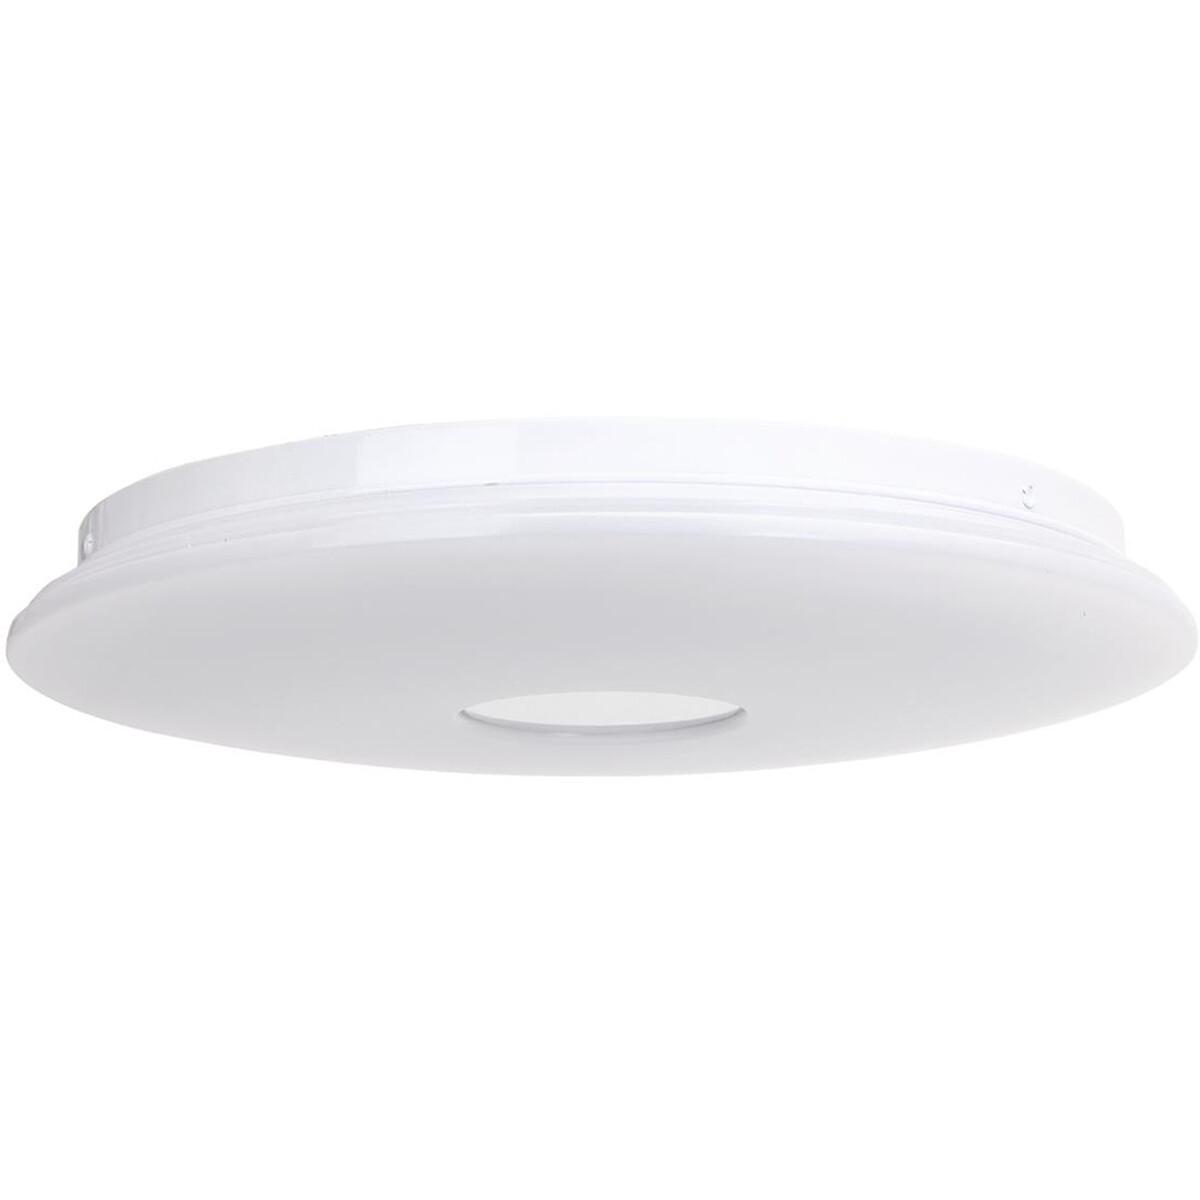 LED Plafondlamp - Smart LED - Trion Ikano - 18W - Aanpasbare Kleur - RGB - Rond - Mat Wit - Aluminiu